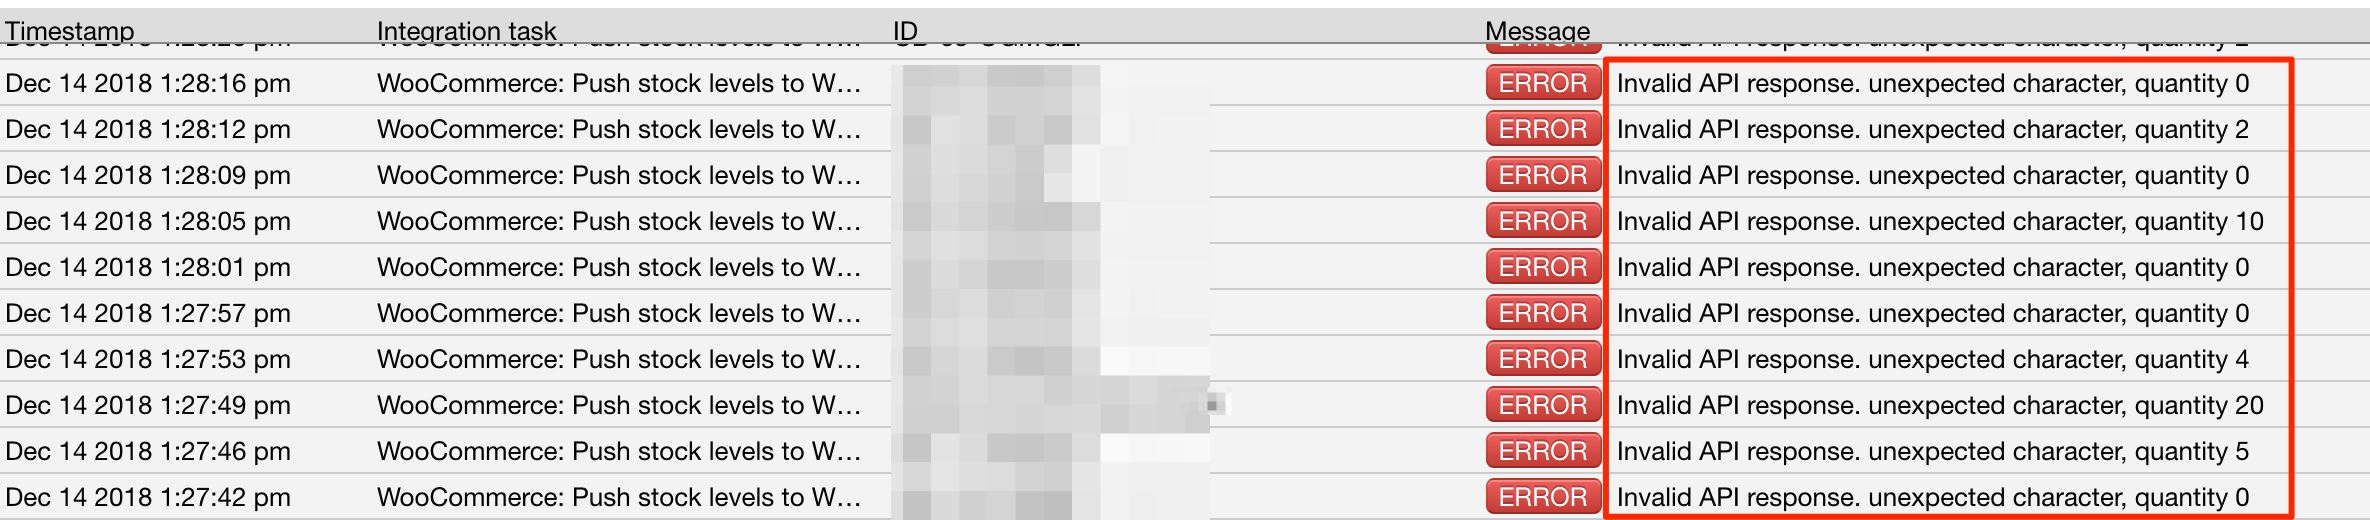 Invalid API response, unexpected character violation